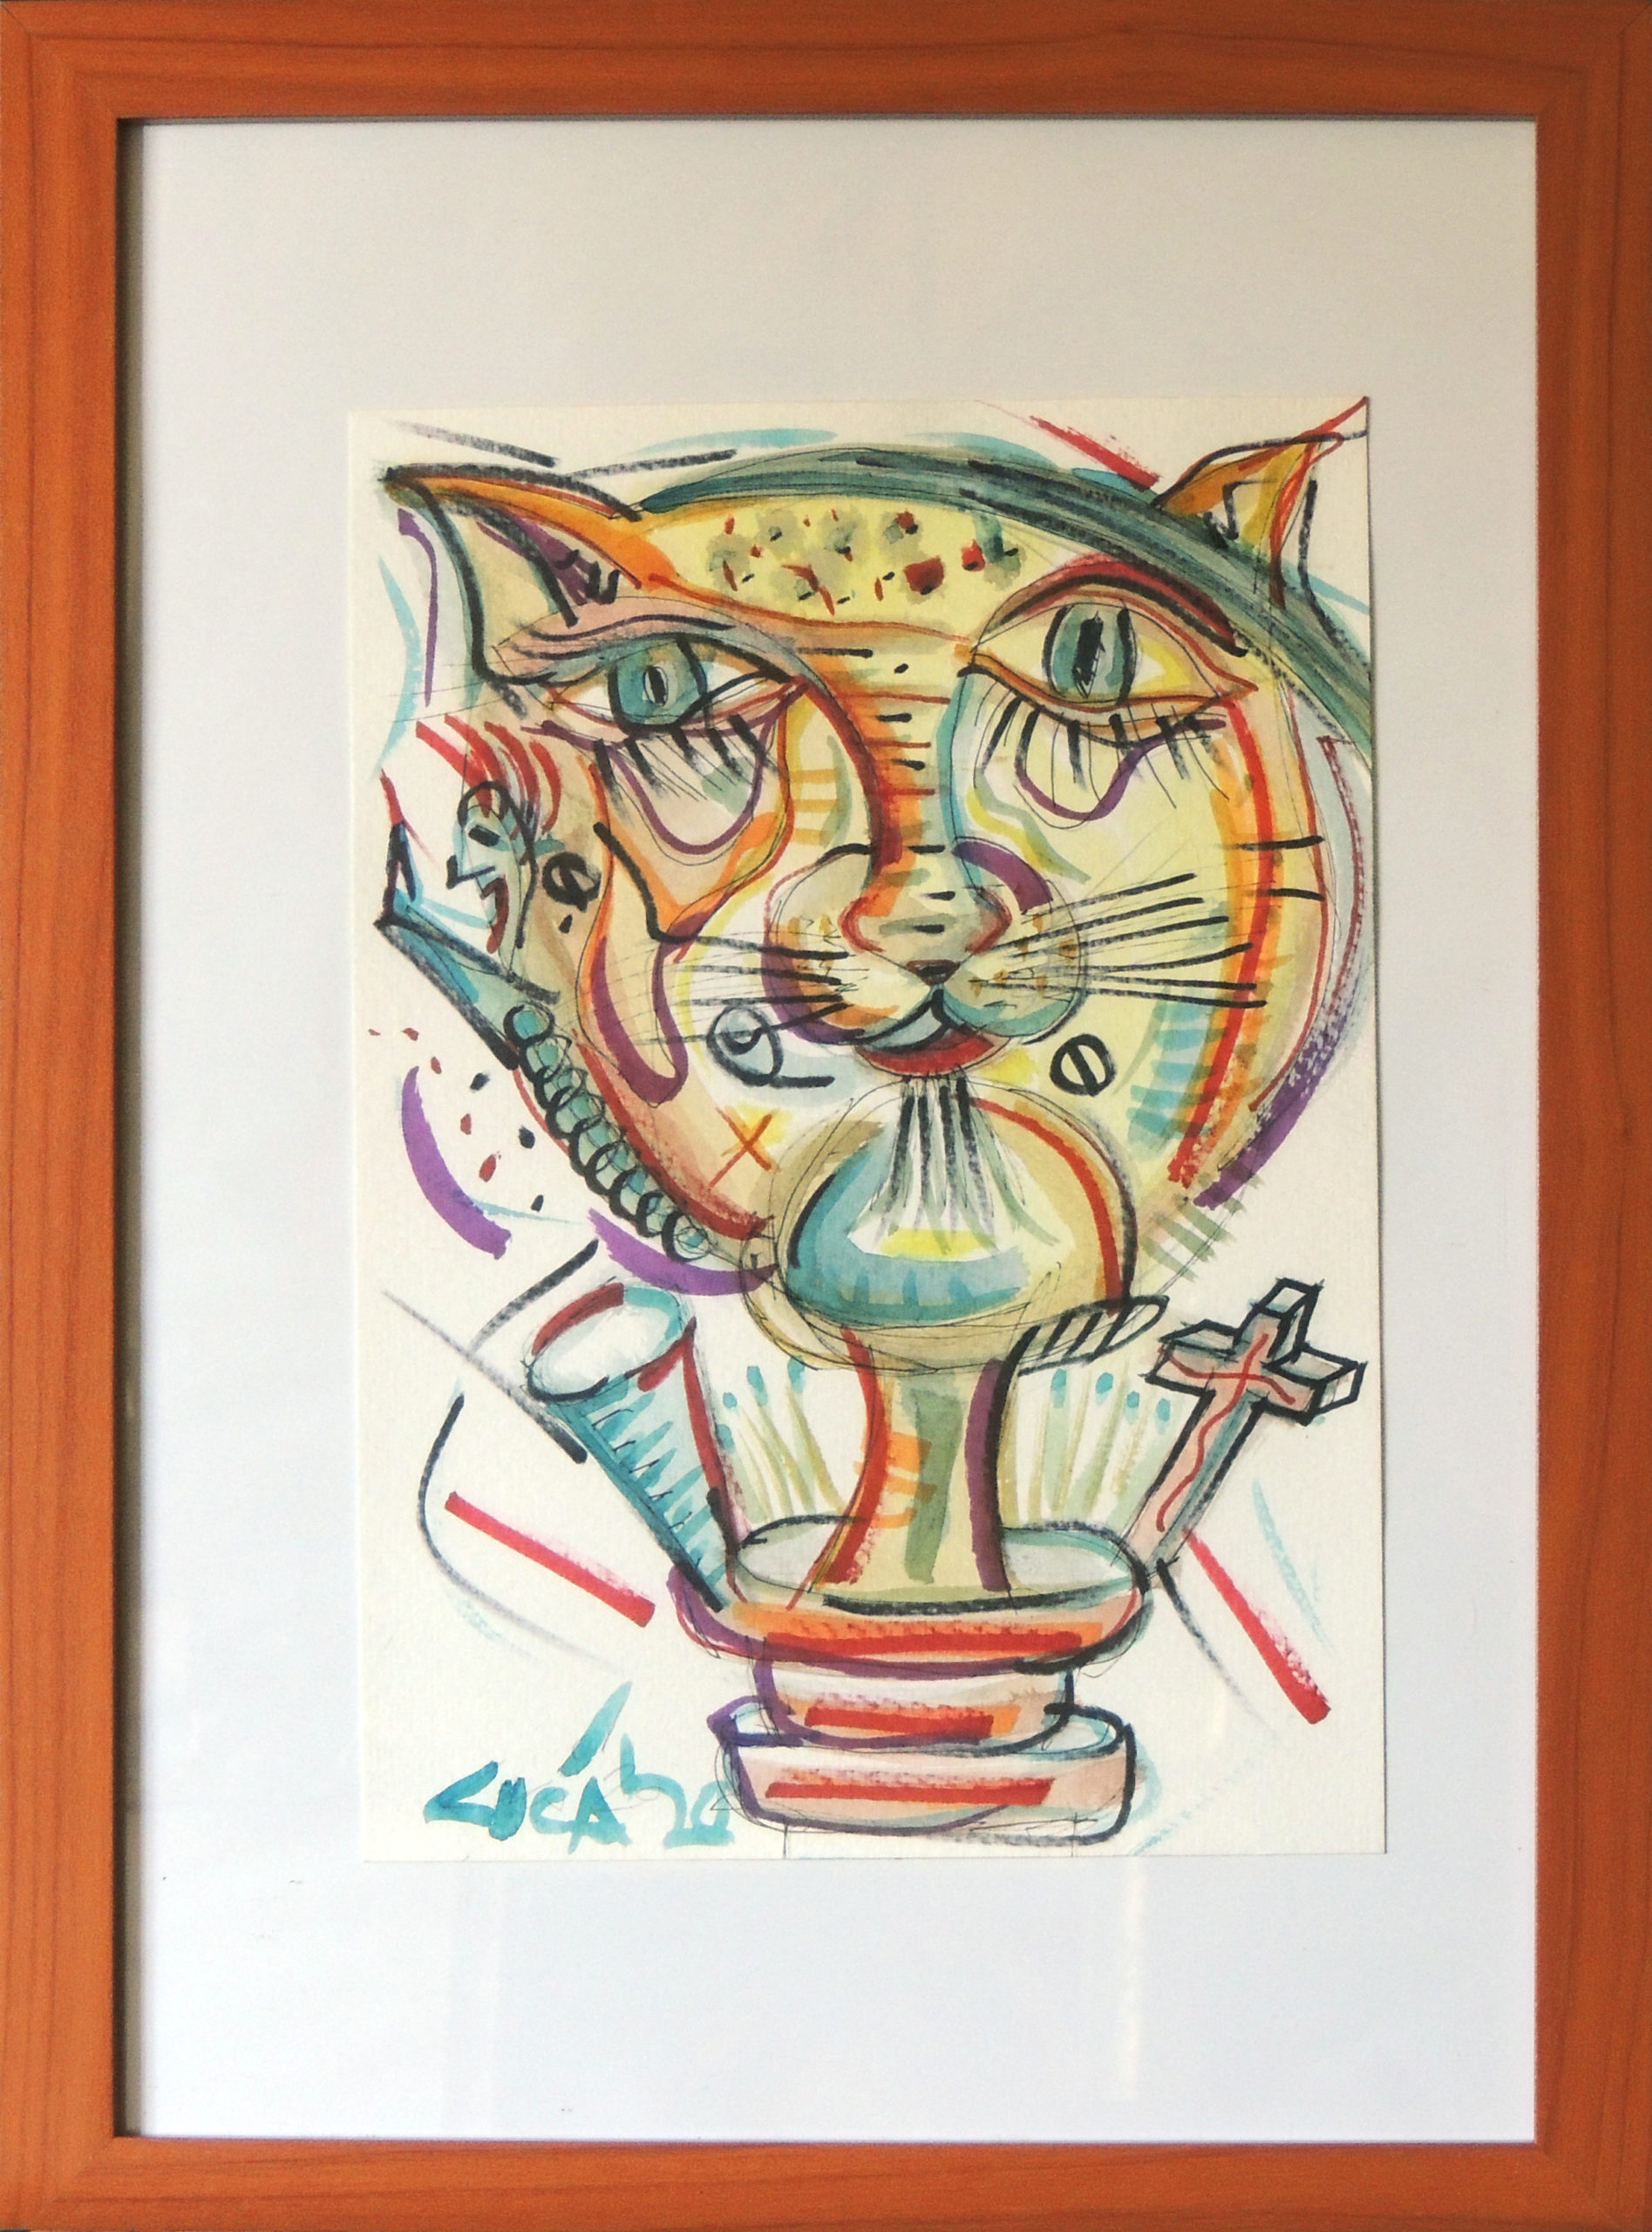 Il felino - acquerello e pennarello